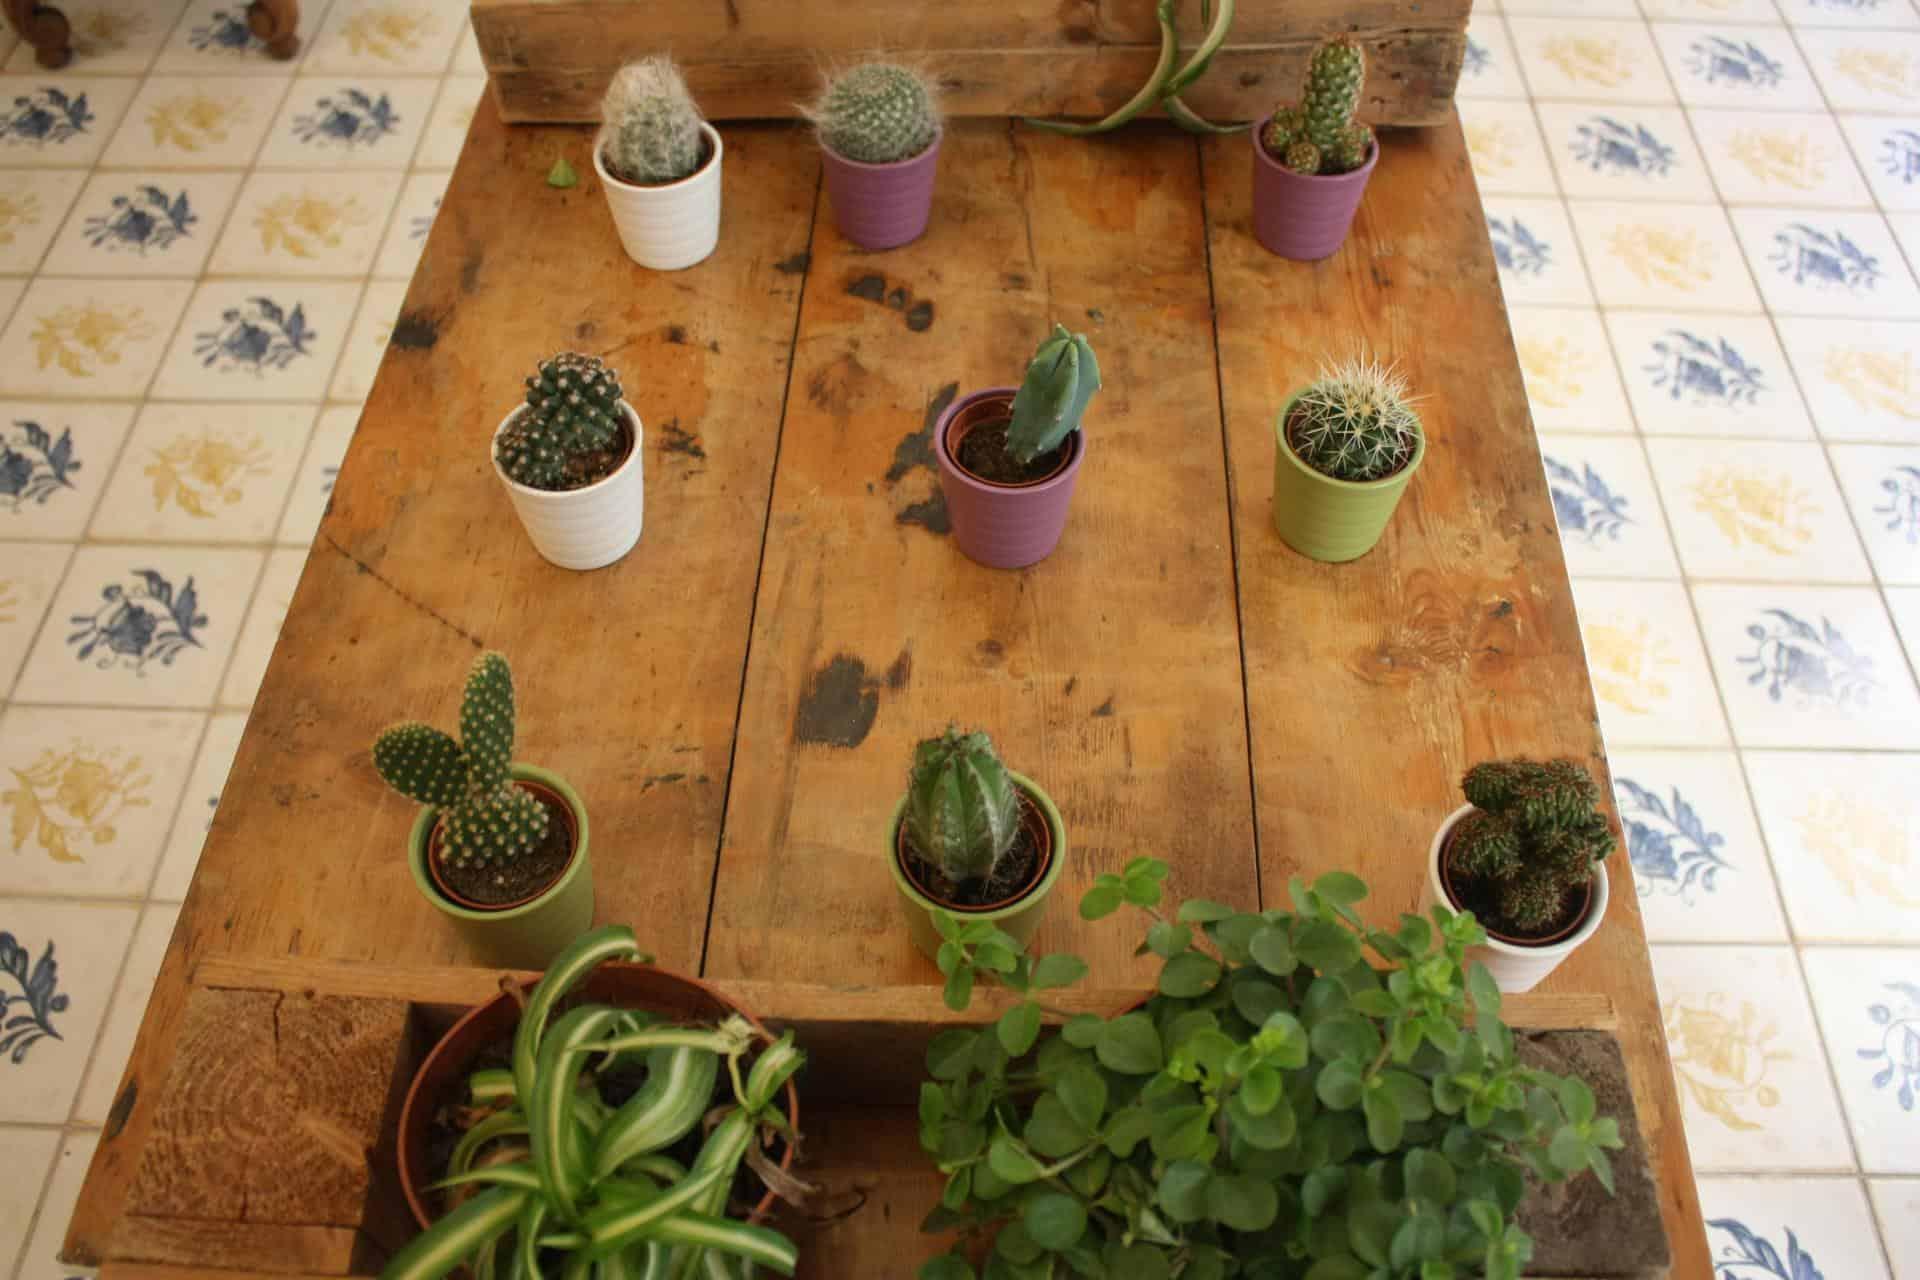 coco cactuses